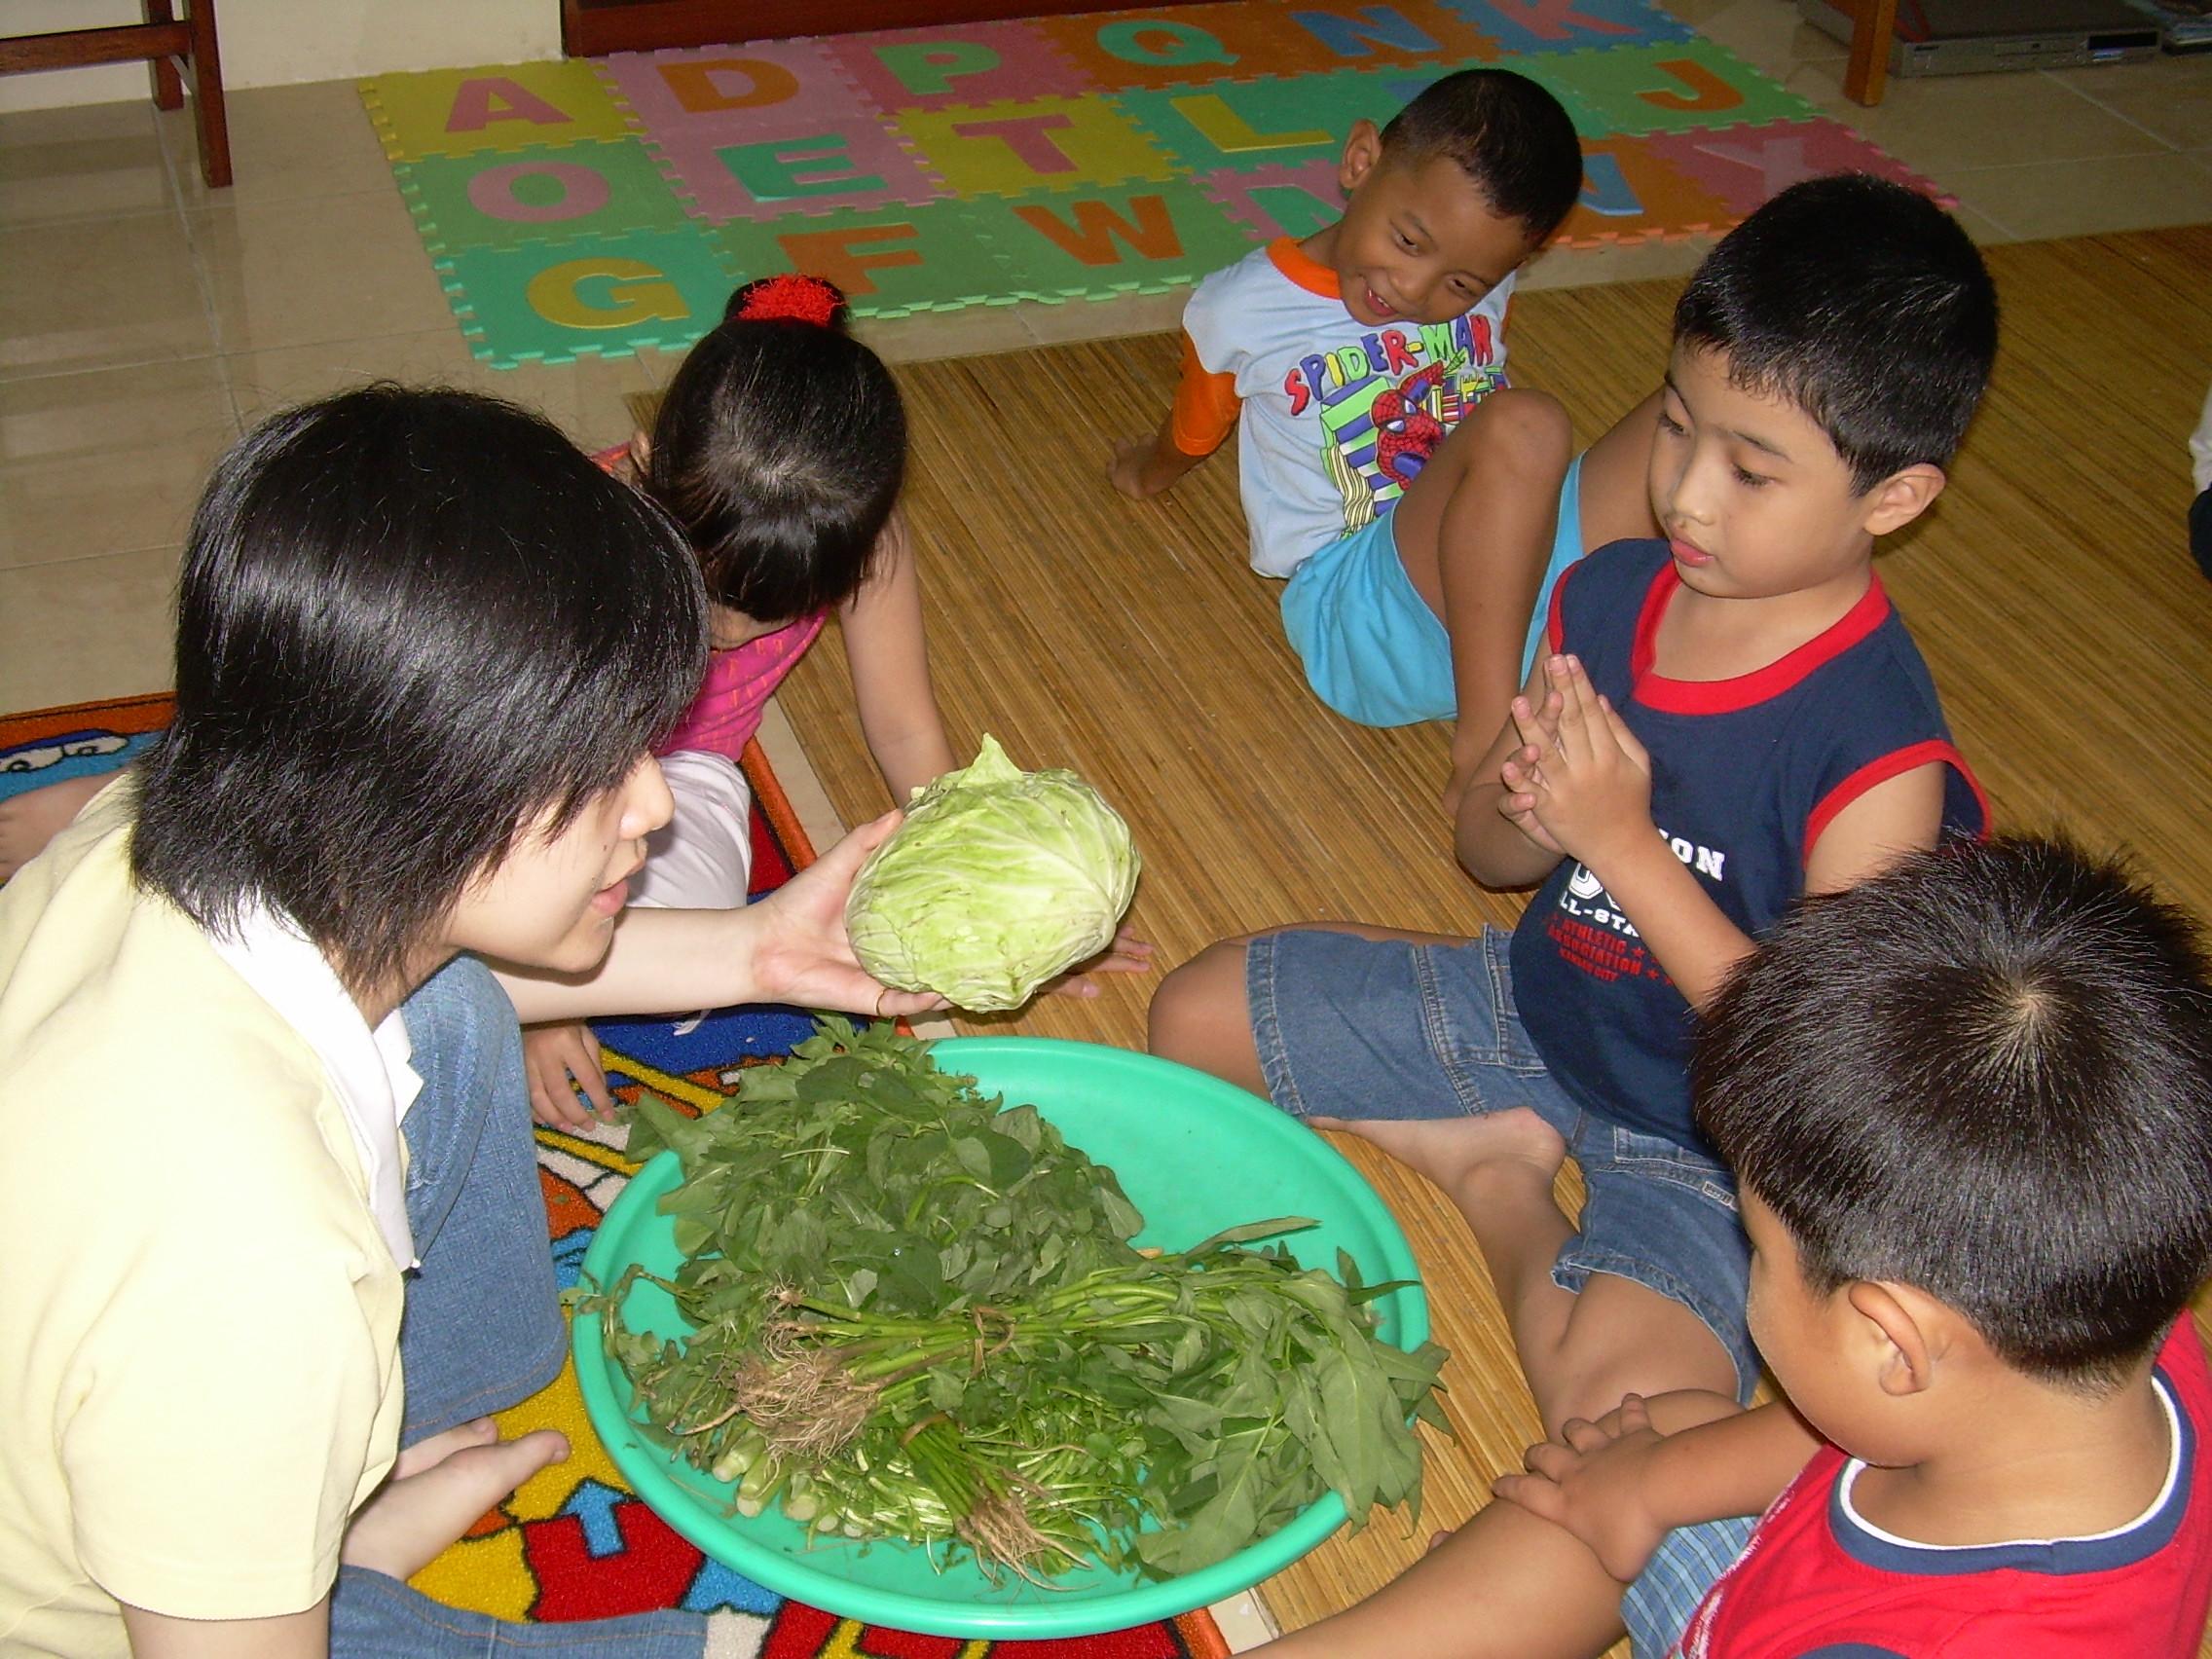 discussion on veggies